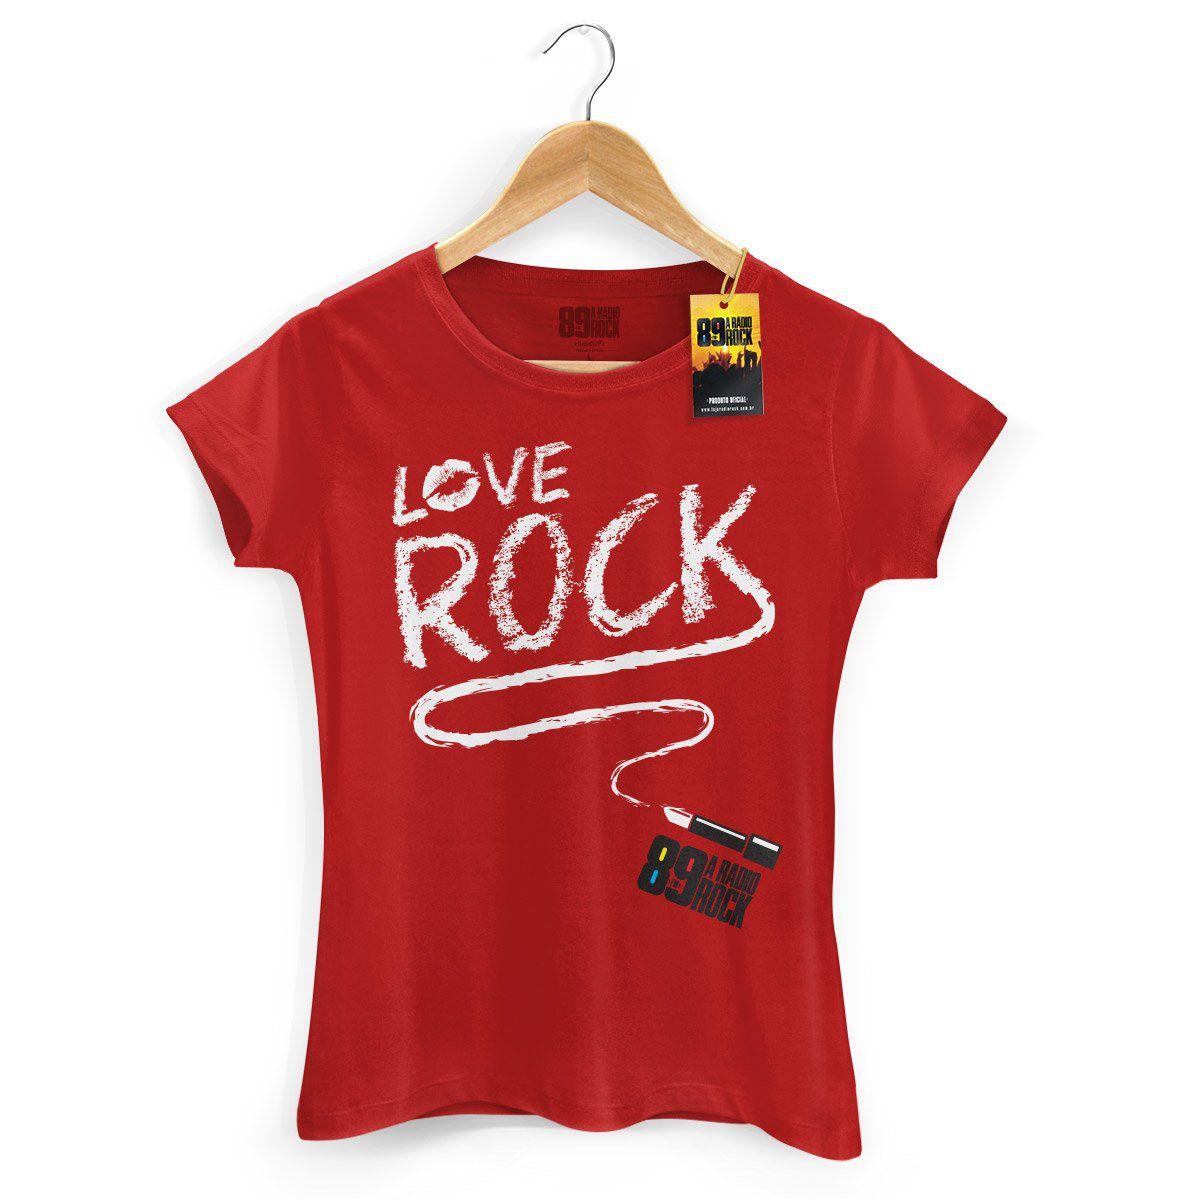 Camiseta Feminina 89 FM Love Rock  - bandUP Store Marketplace